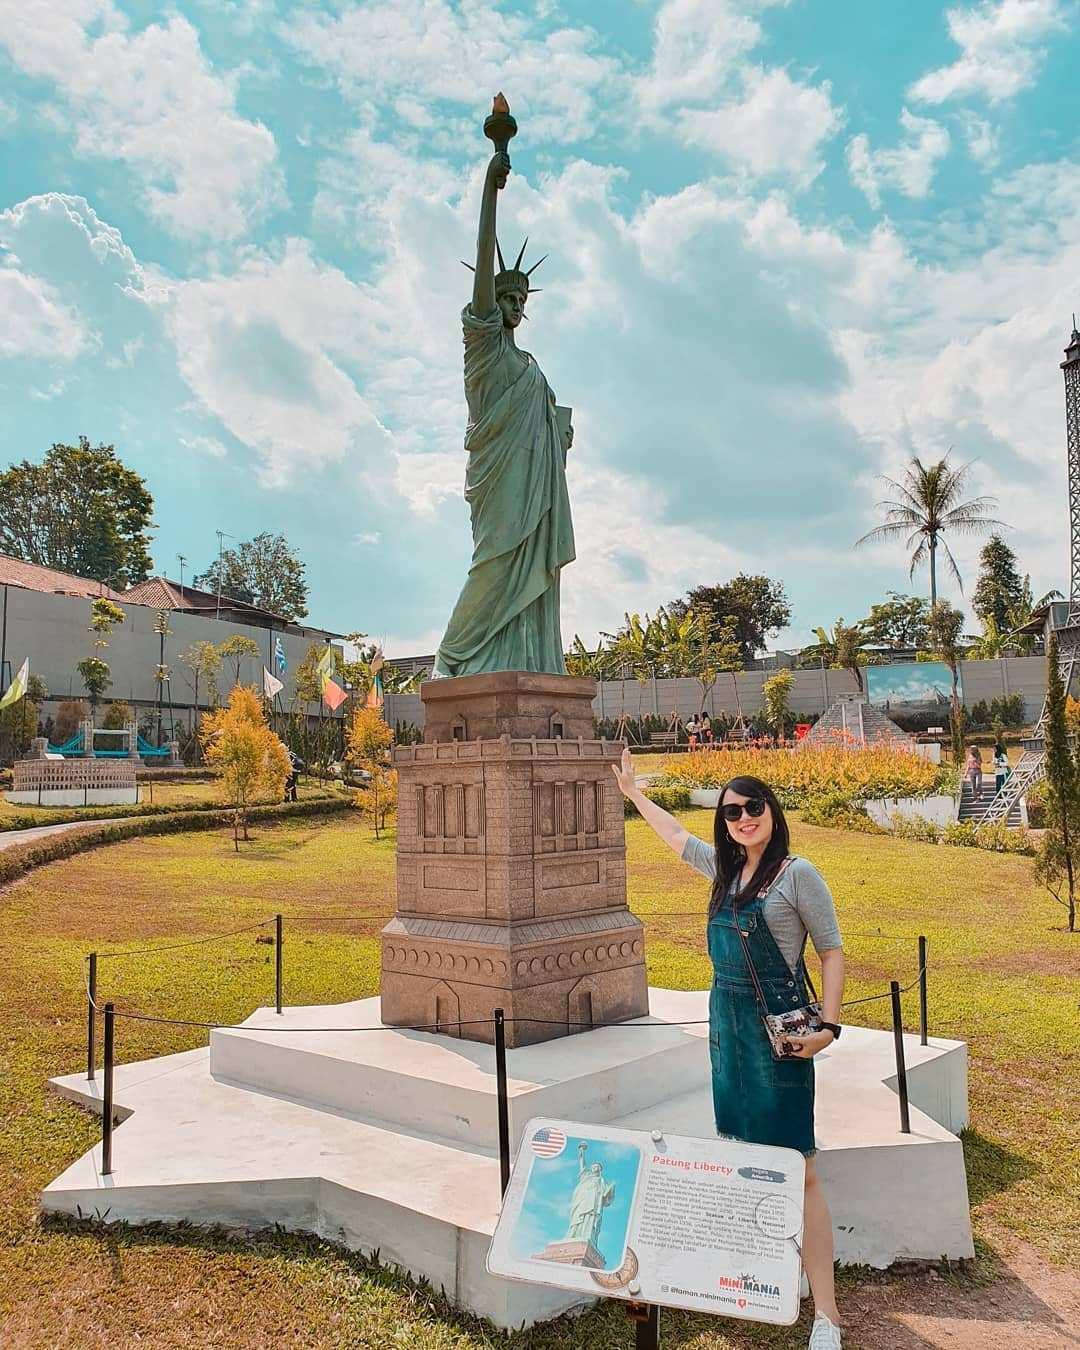 Berfoto di Depan Miniatur Patung Liberty di Taman Mini Mania, Image From @jane.felicia